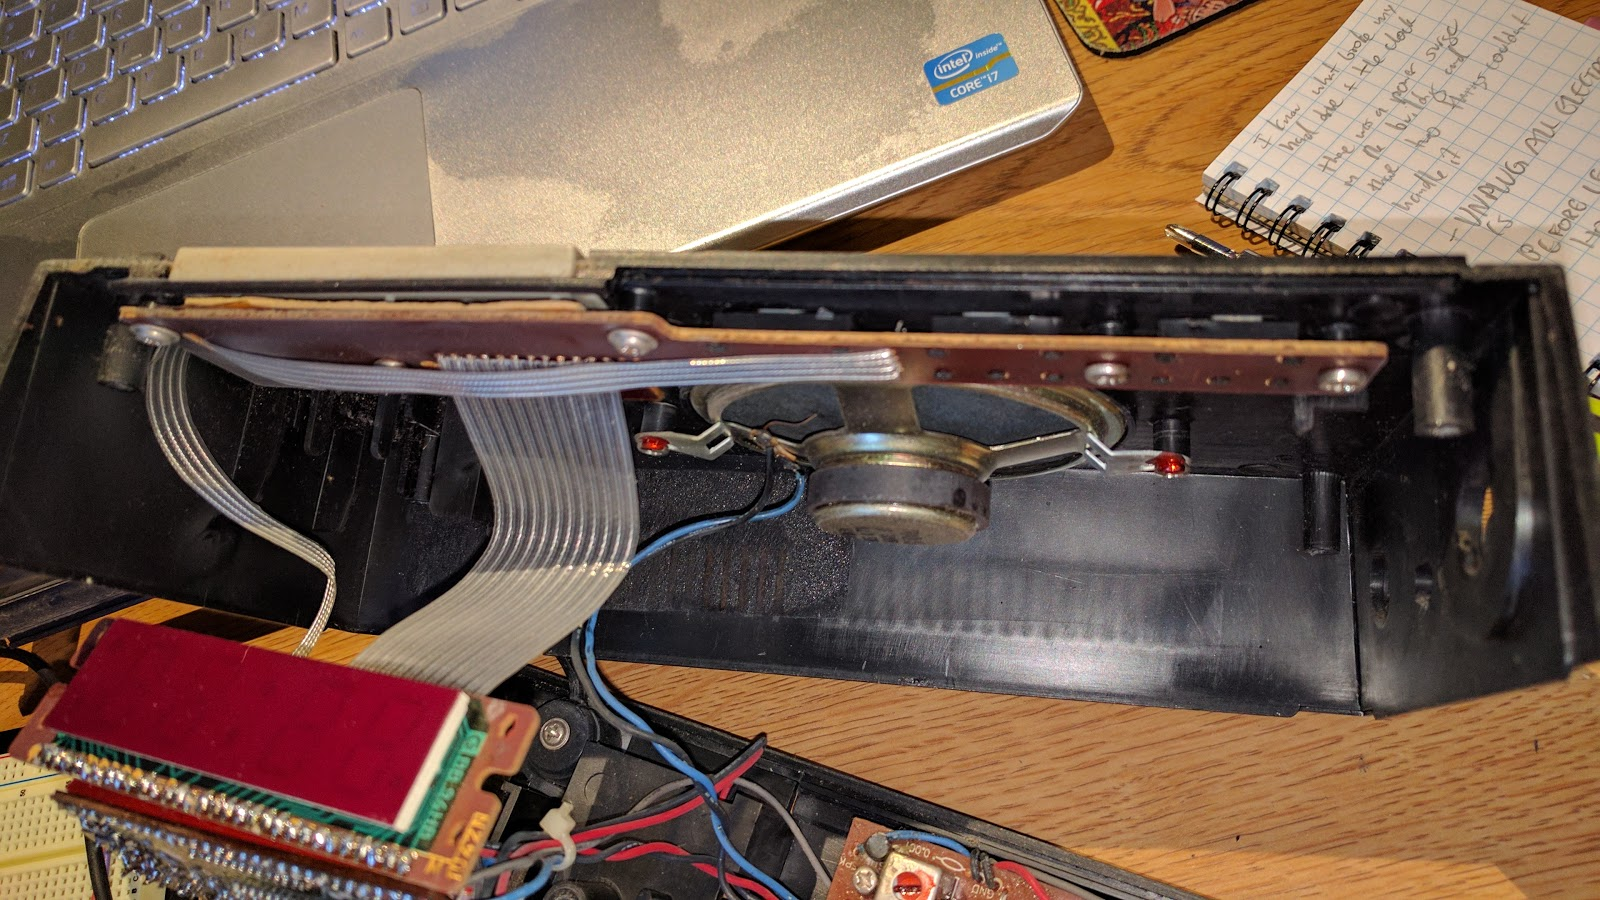 Metal Film Resistor: Inside 1980s Sanyo Radio Alarm Clock